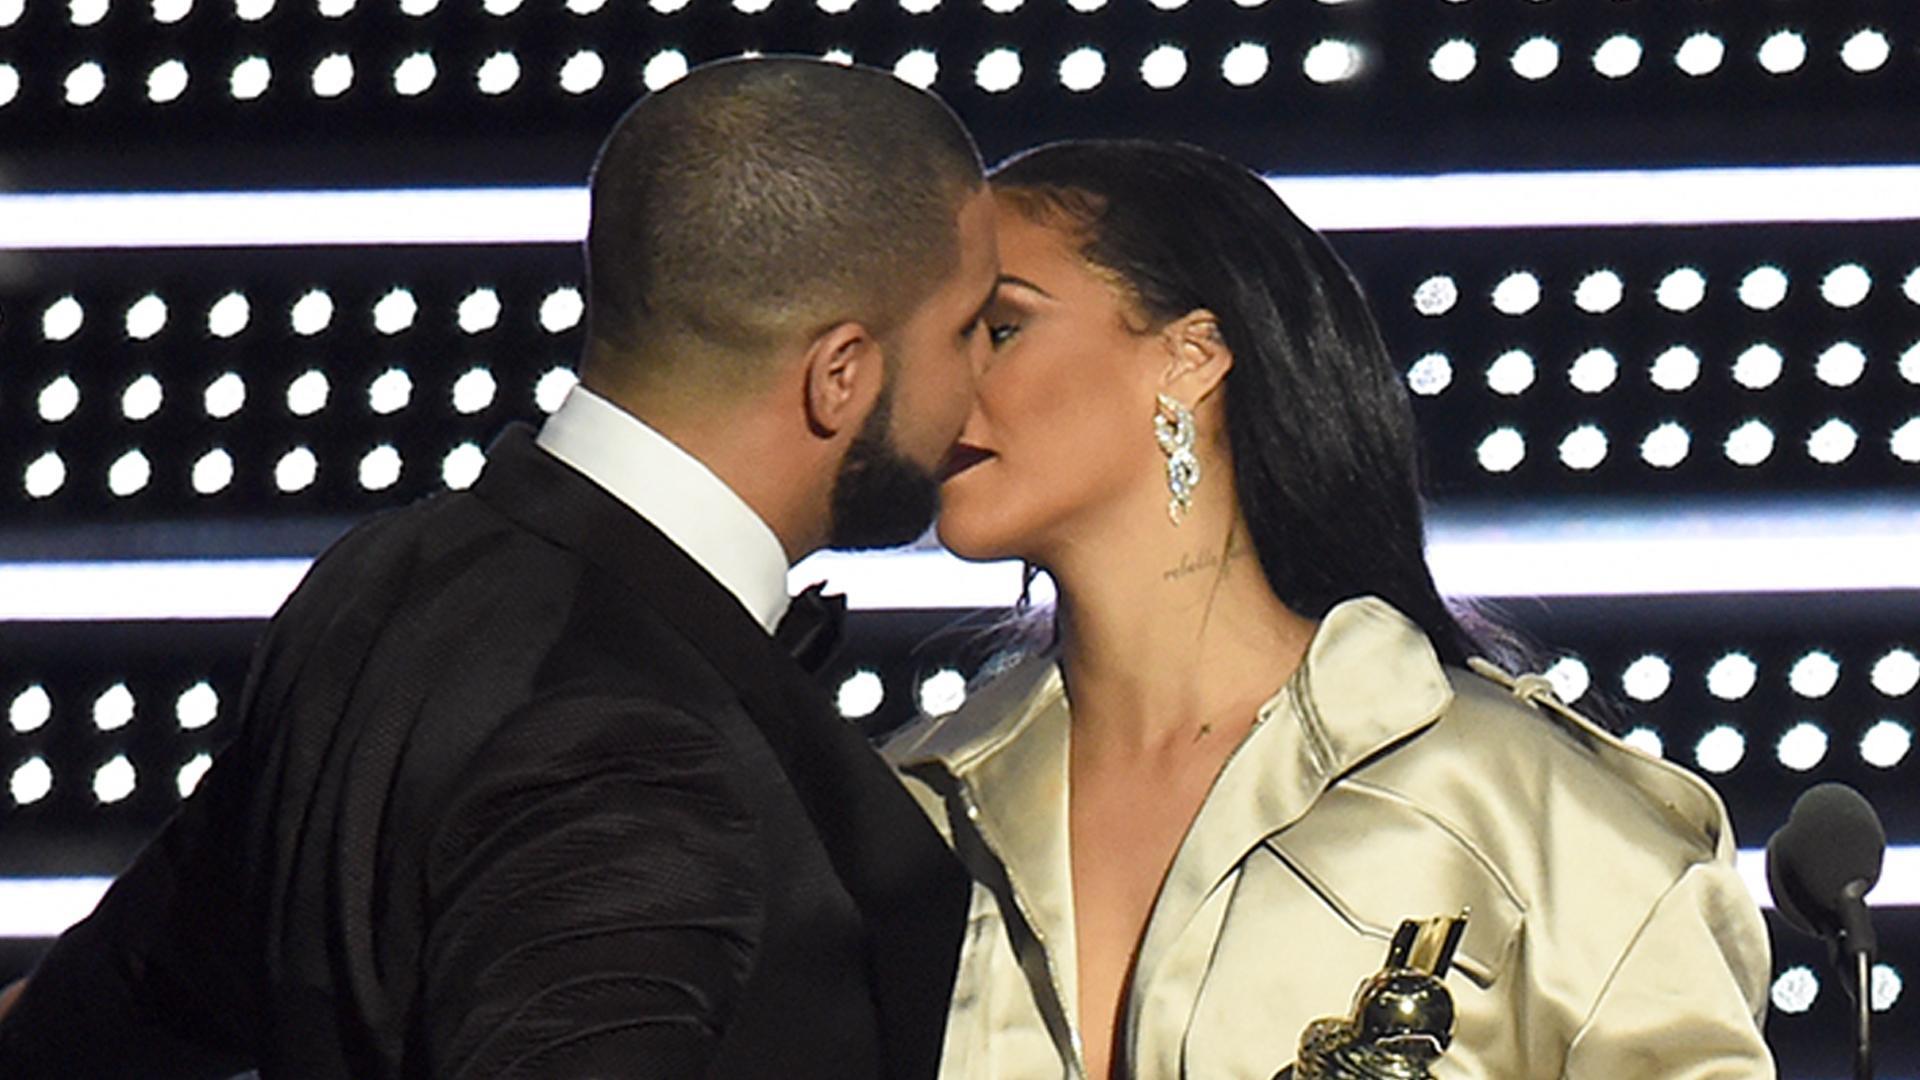 Drake Professes Love For Rihanna On Stage at 2016 MTV VMAs